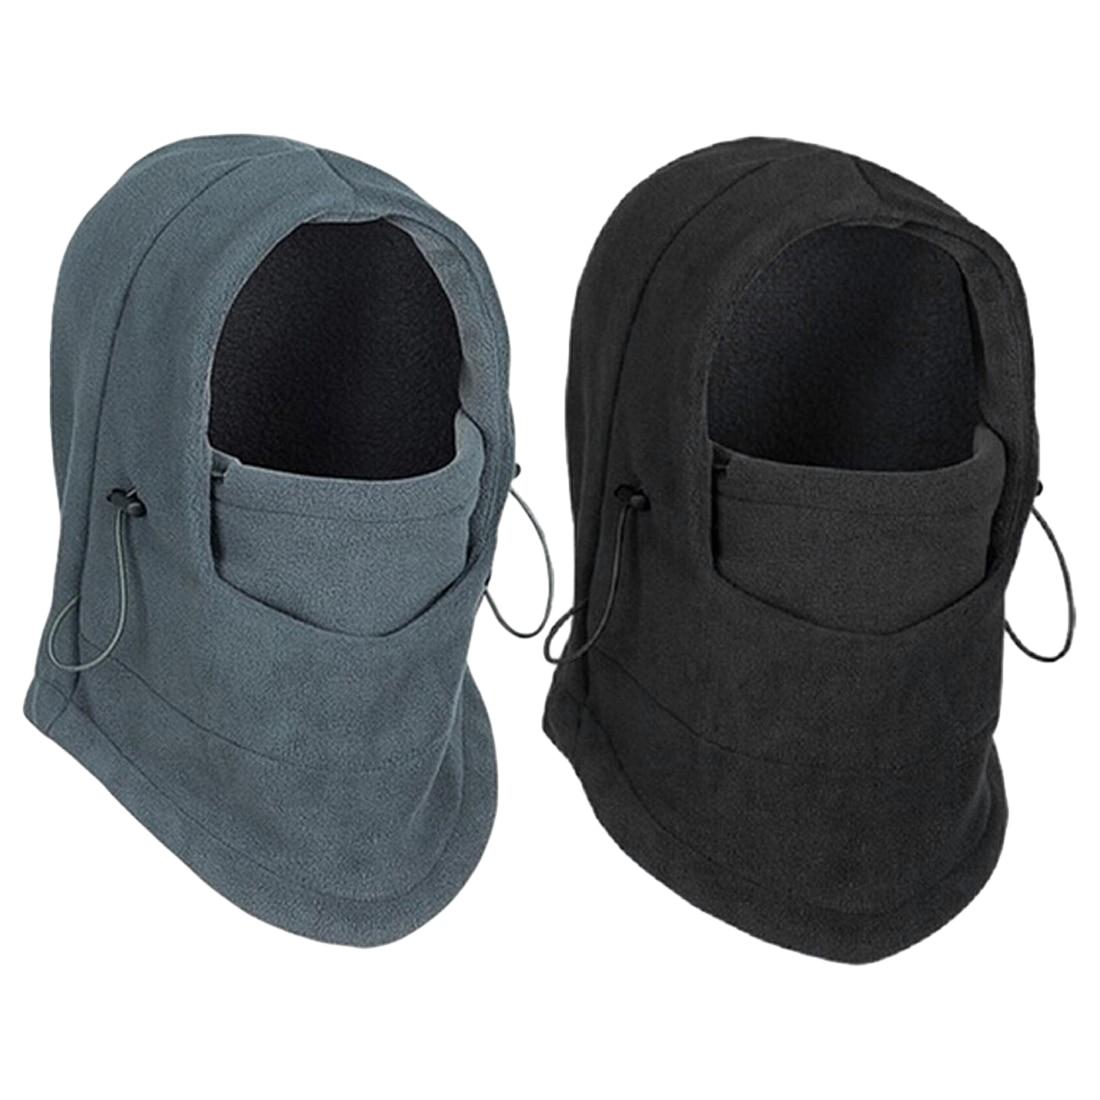 New Balaclava Hat Hooded Neck Warmer Winter Sports Face Mask For Men Ski Bike Motorcycle Helmet Beanies Masked Cap